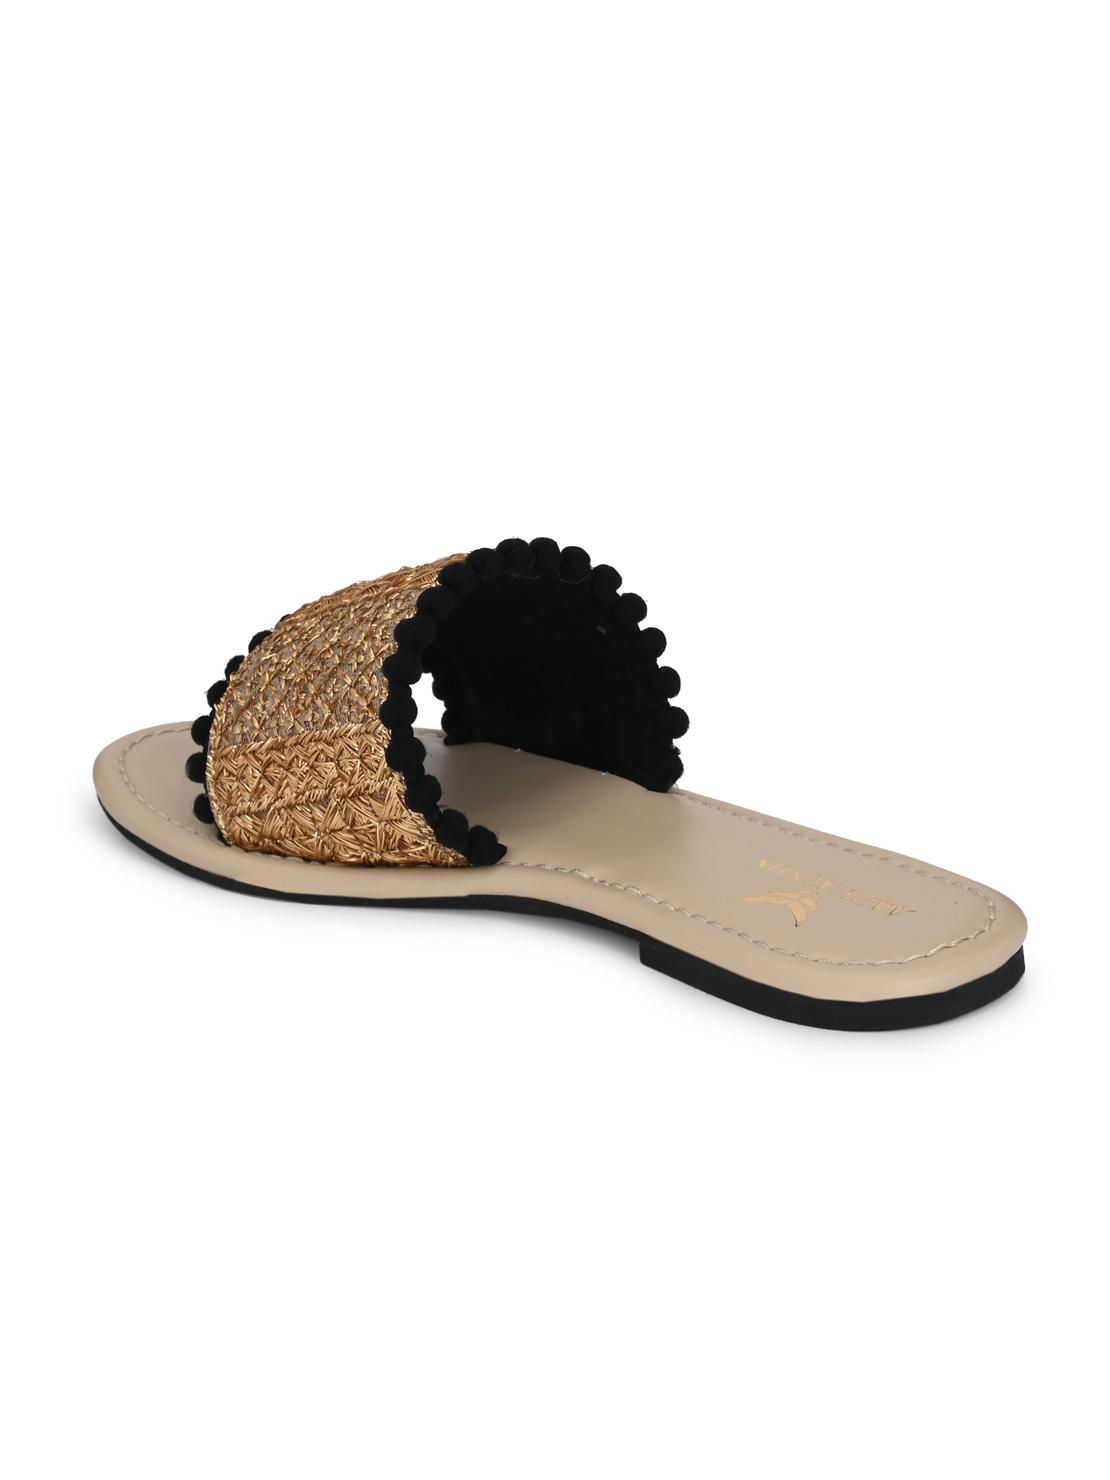 AADY AUSTIN | Aady Austin Open Toe Flats